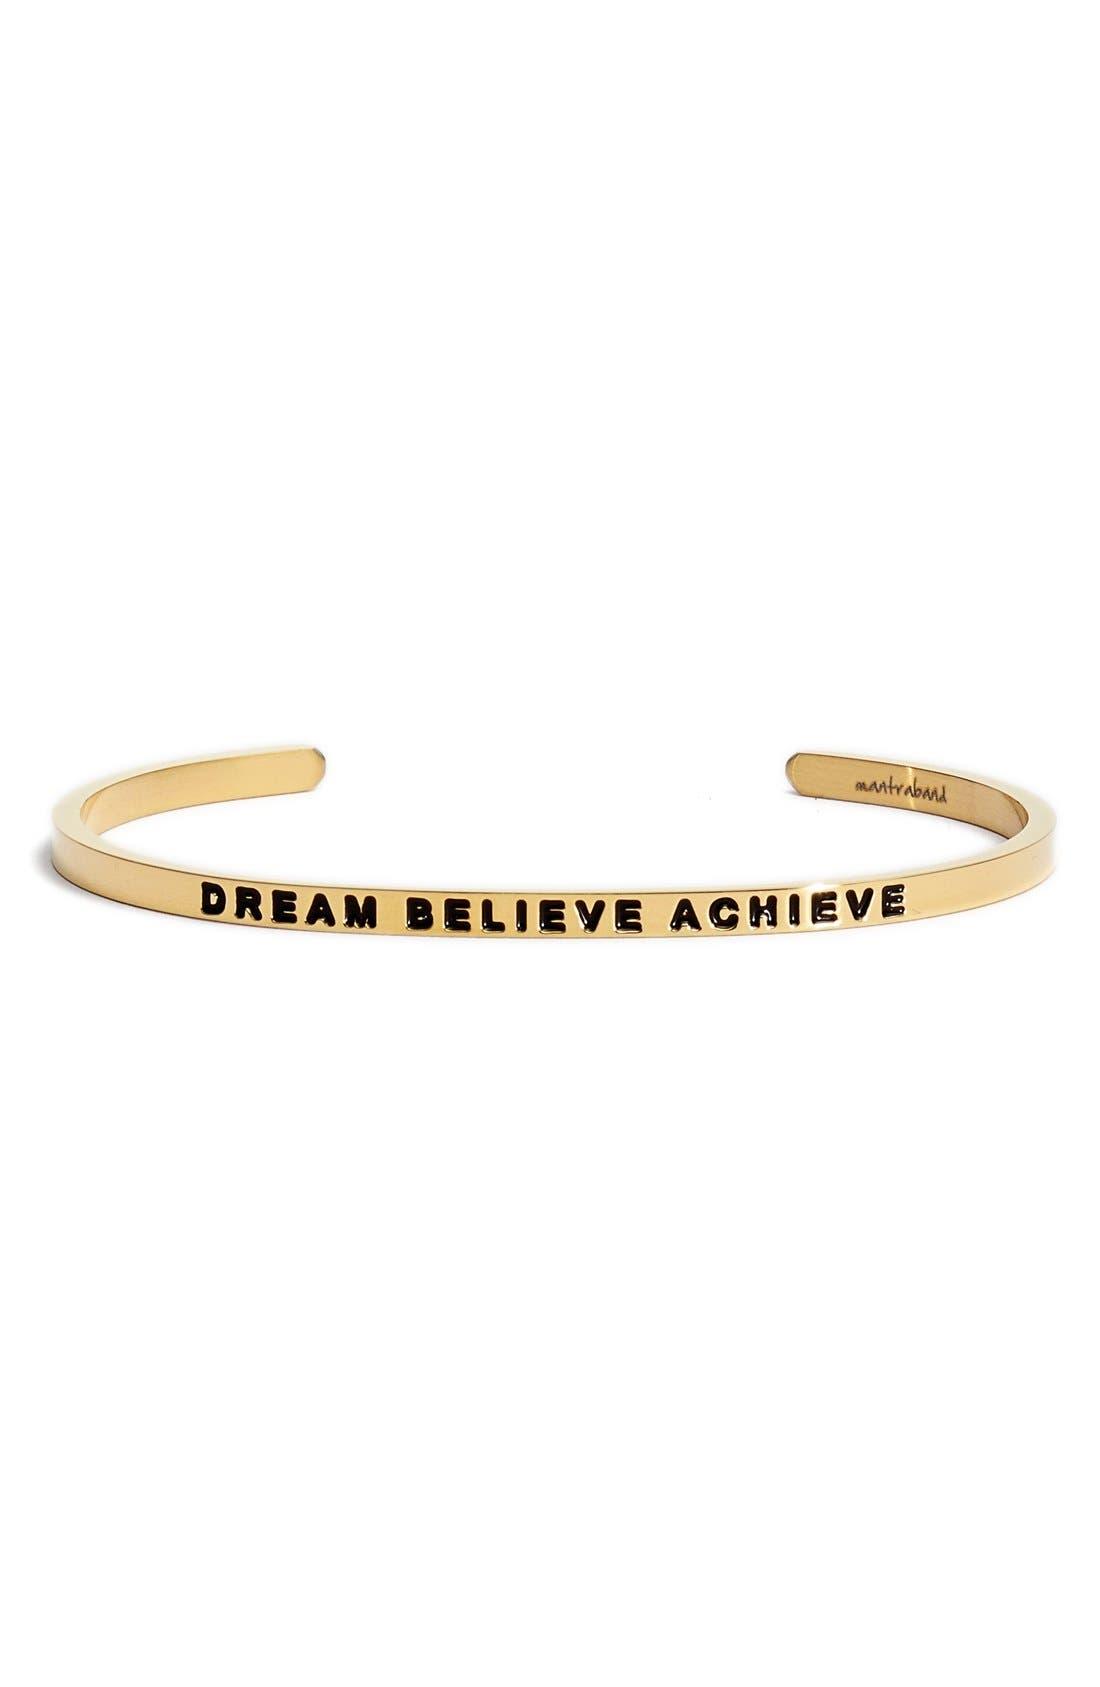 Alternate Image 1 Selected - MantraBand® 'Dream Believe Achieve' Cuff